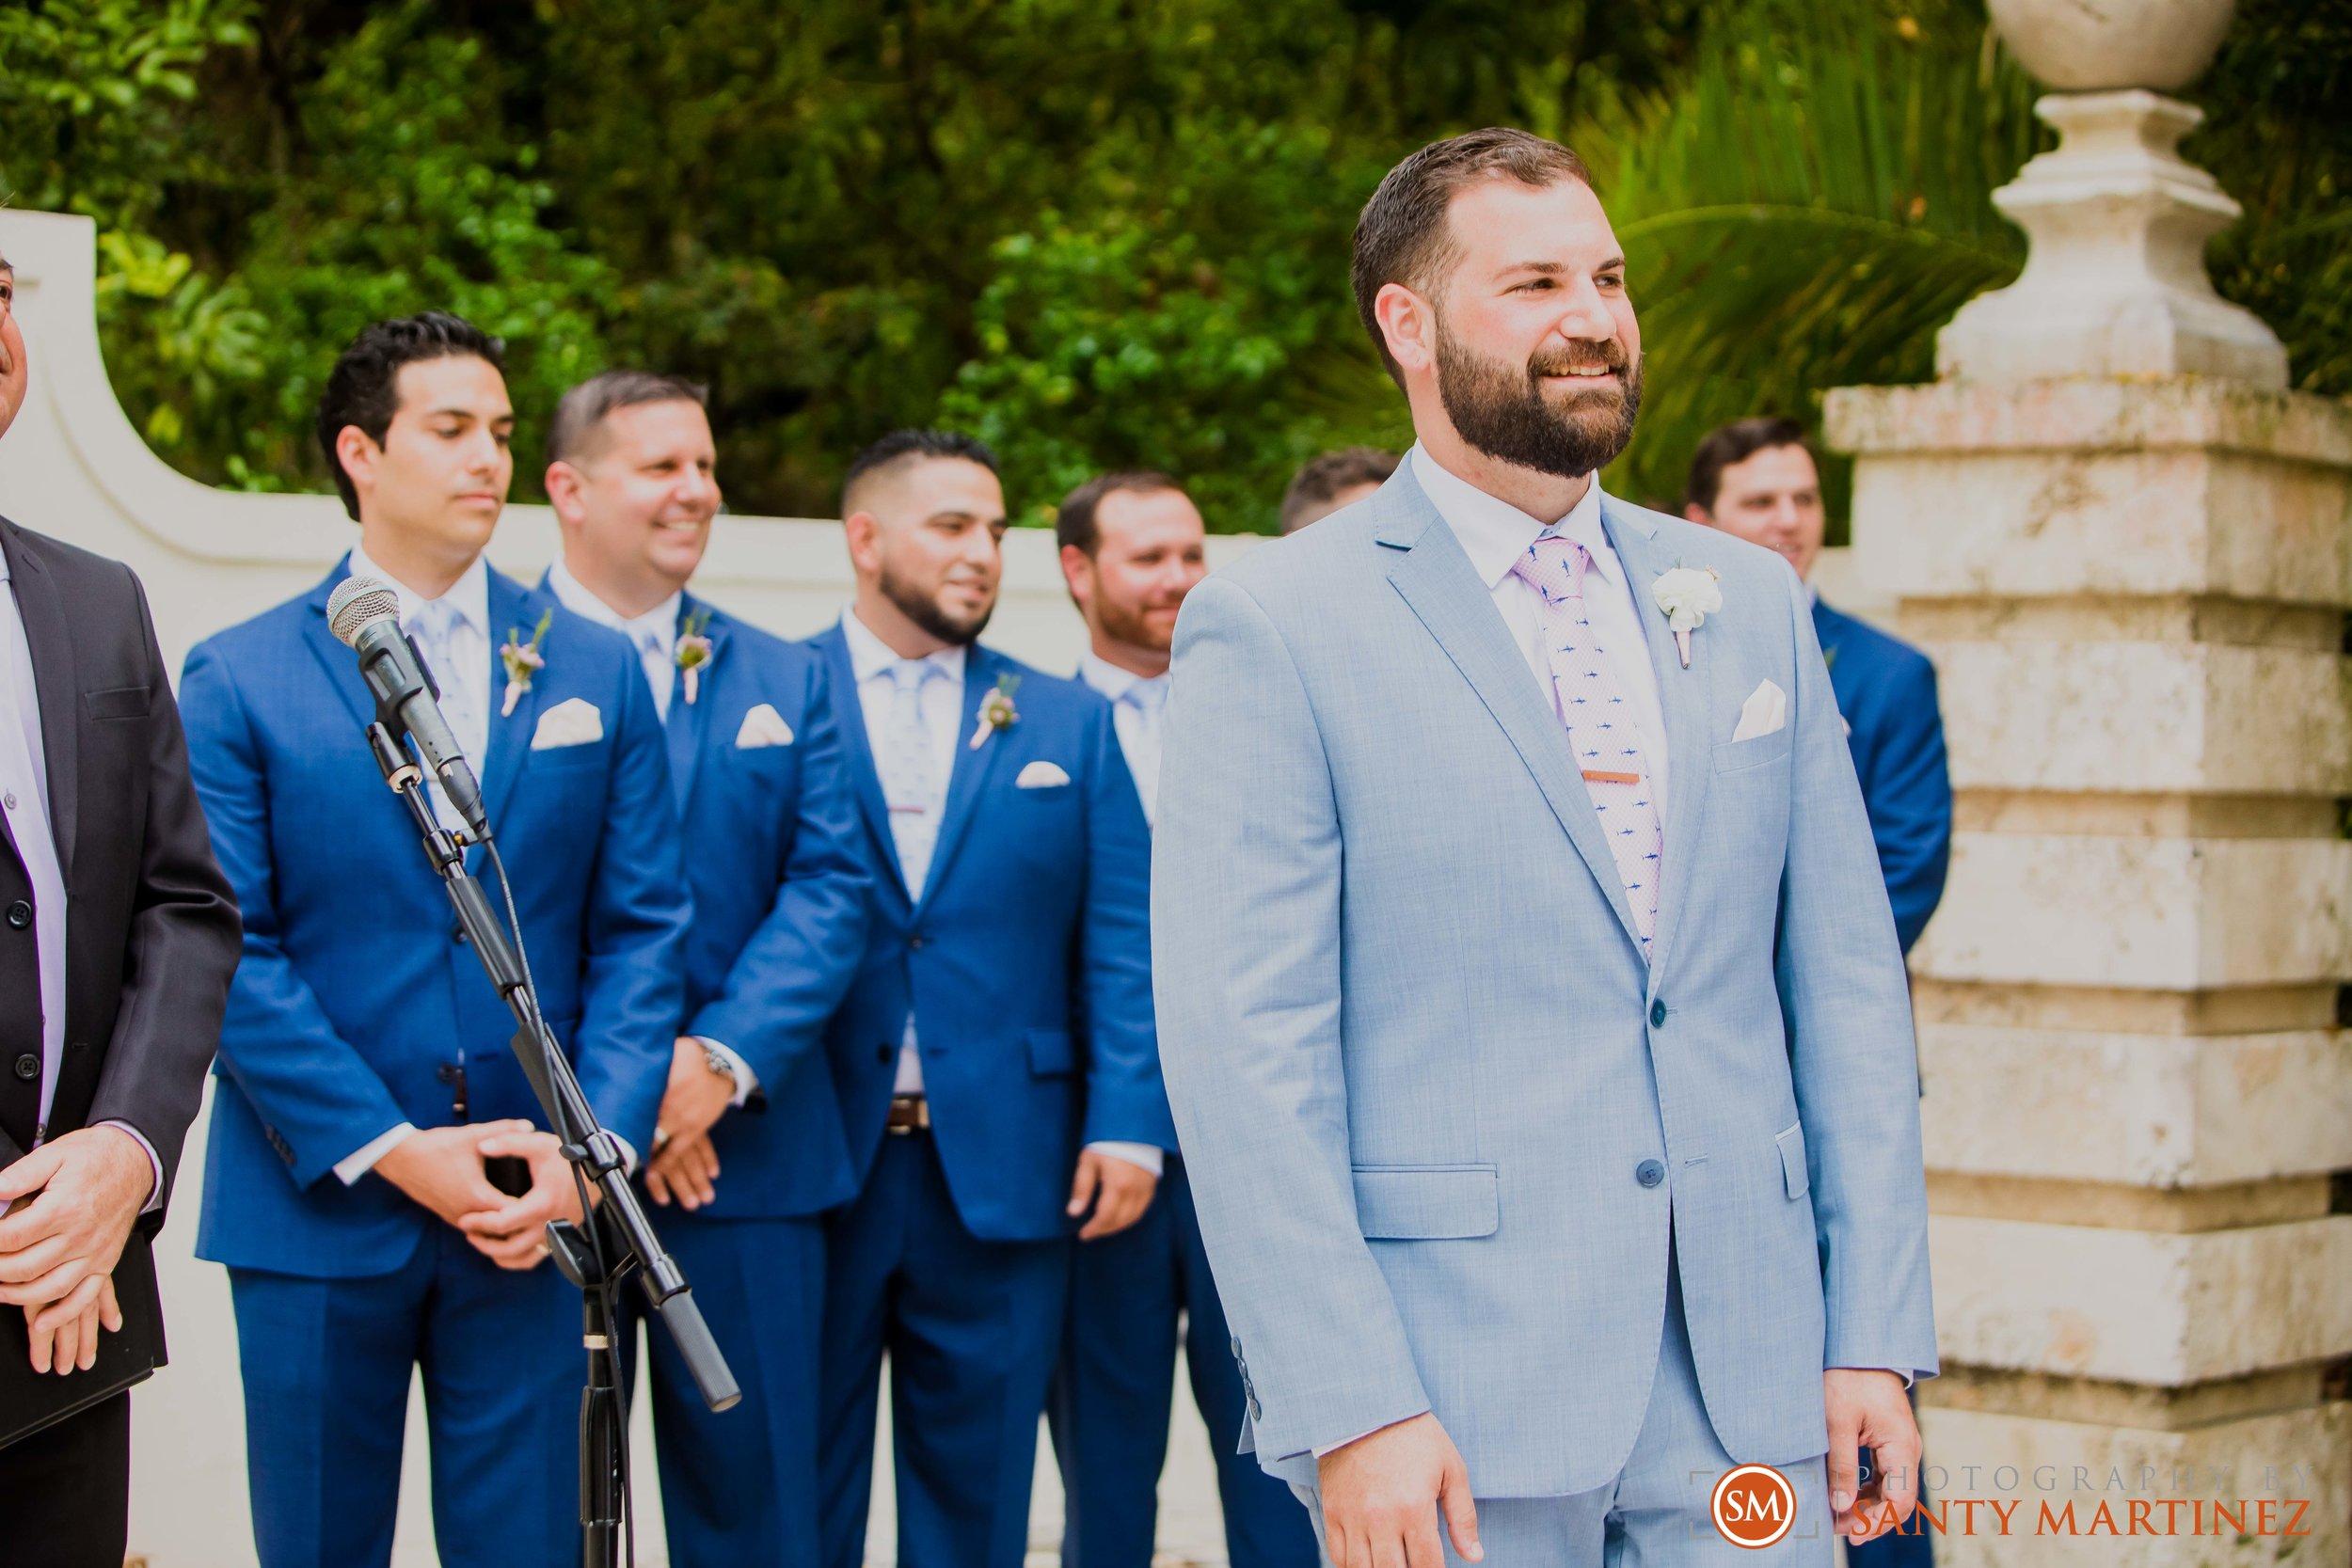 Wedding Bonnet House - Santy Martinez Photography-28.jpg